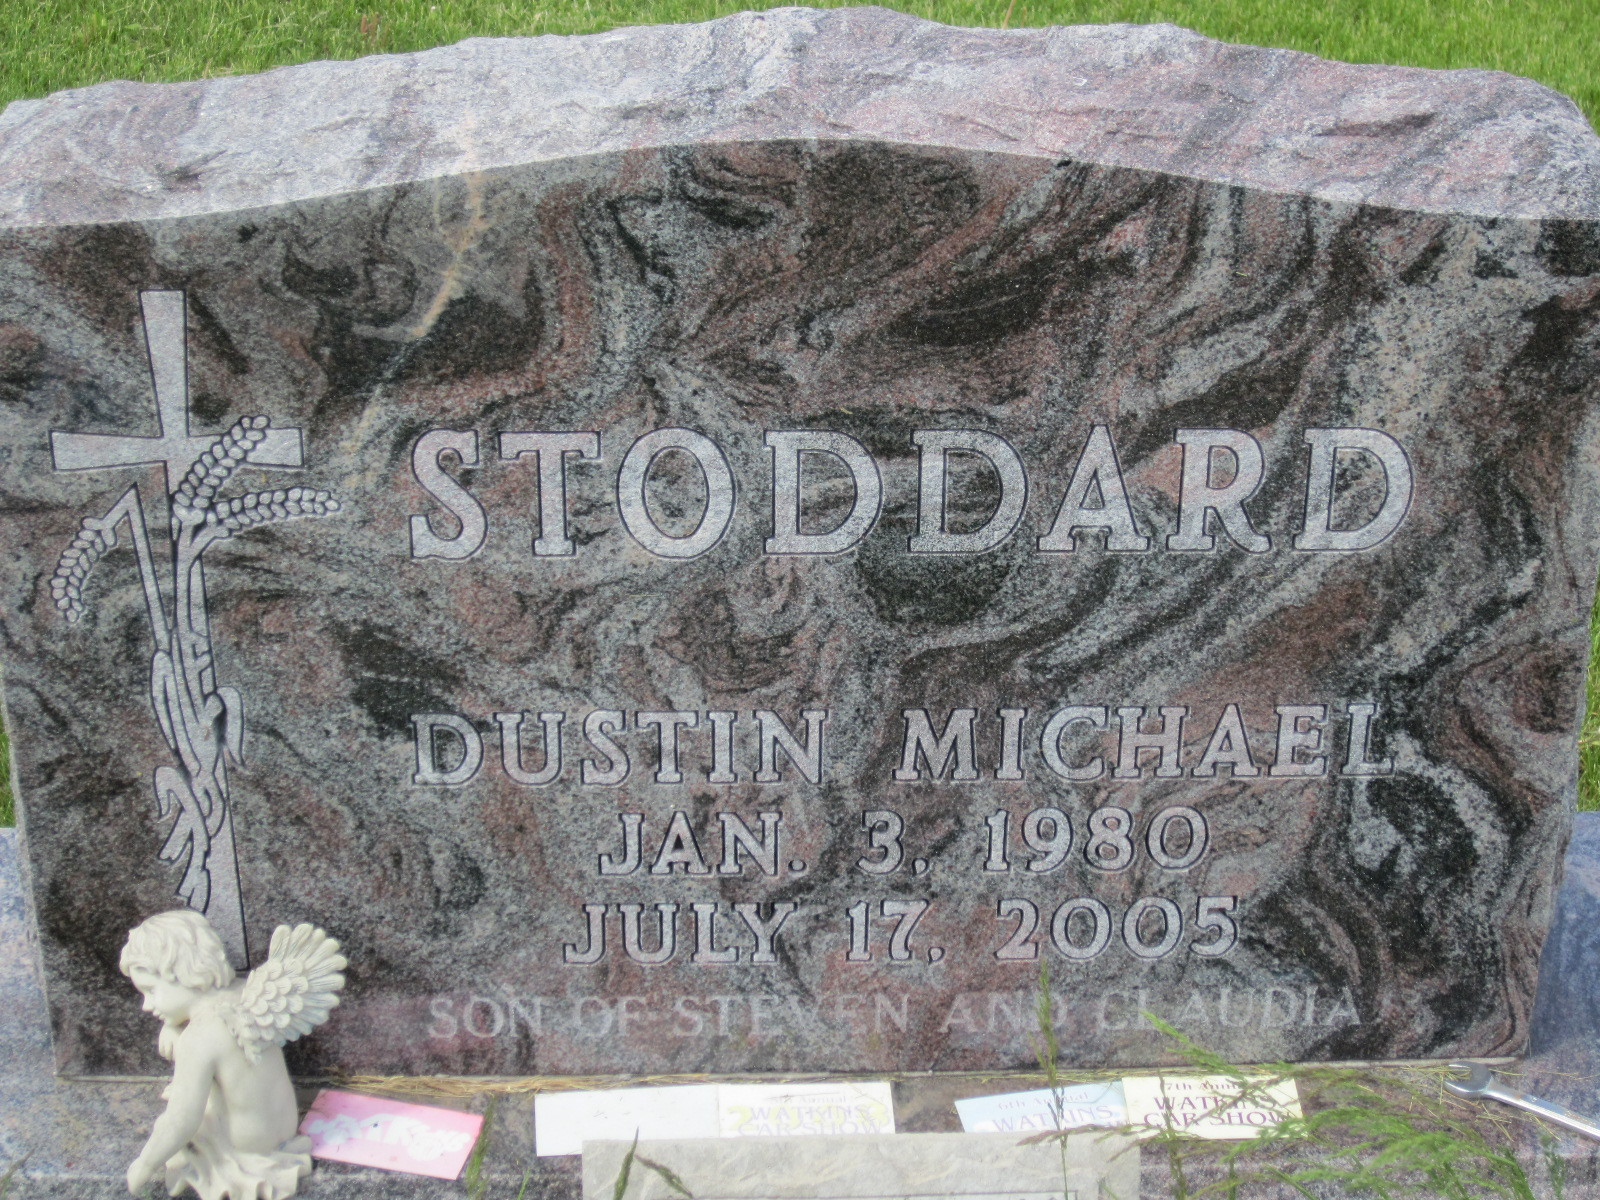 Michael Stoddard